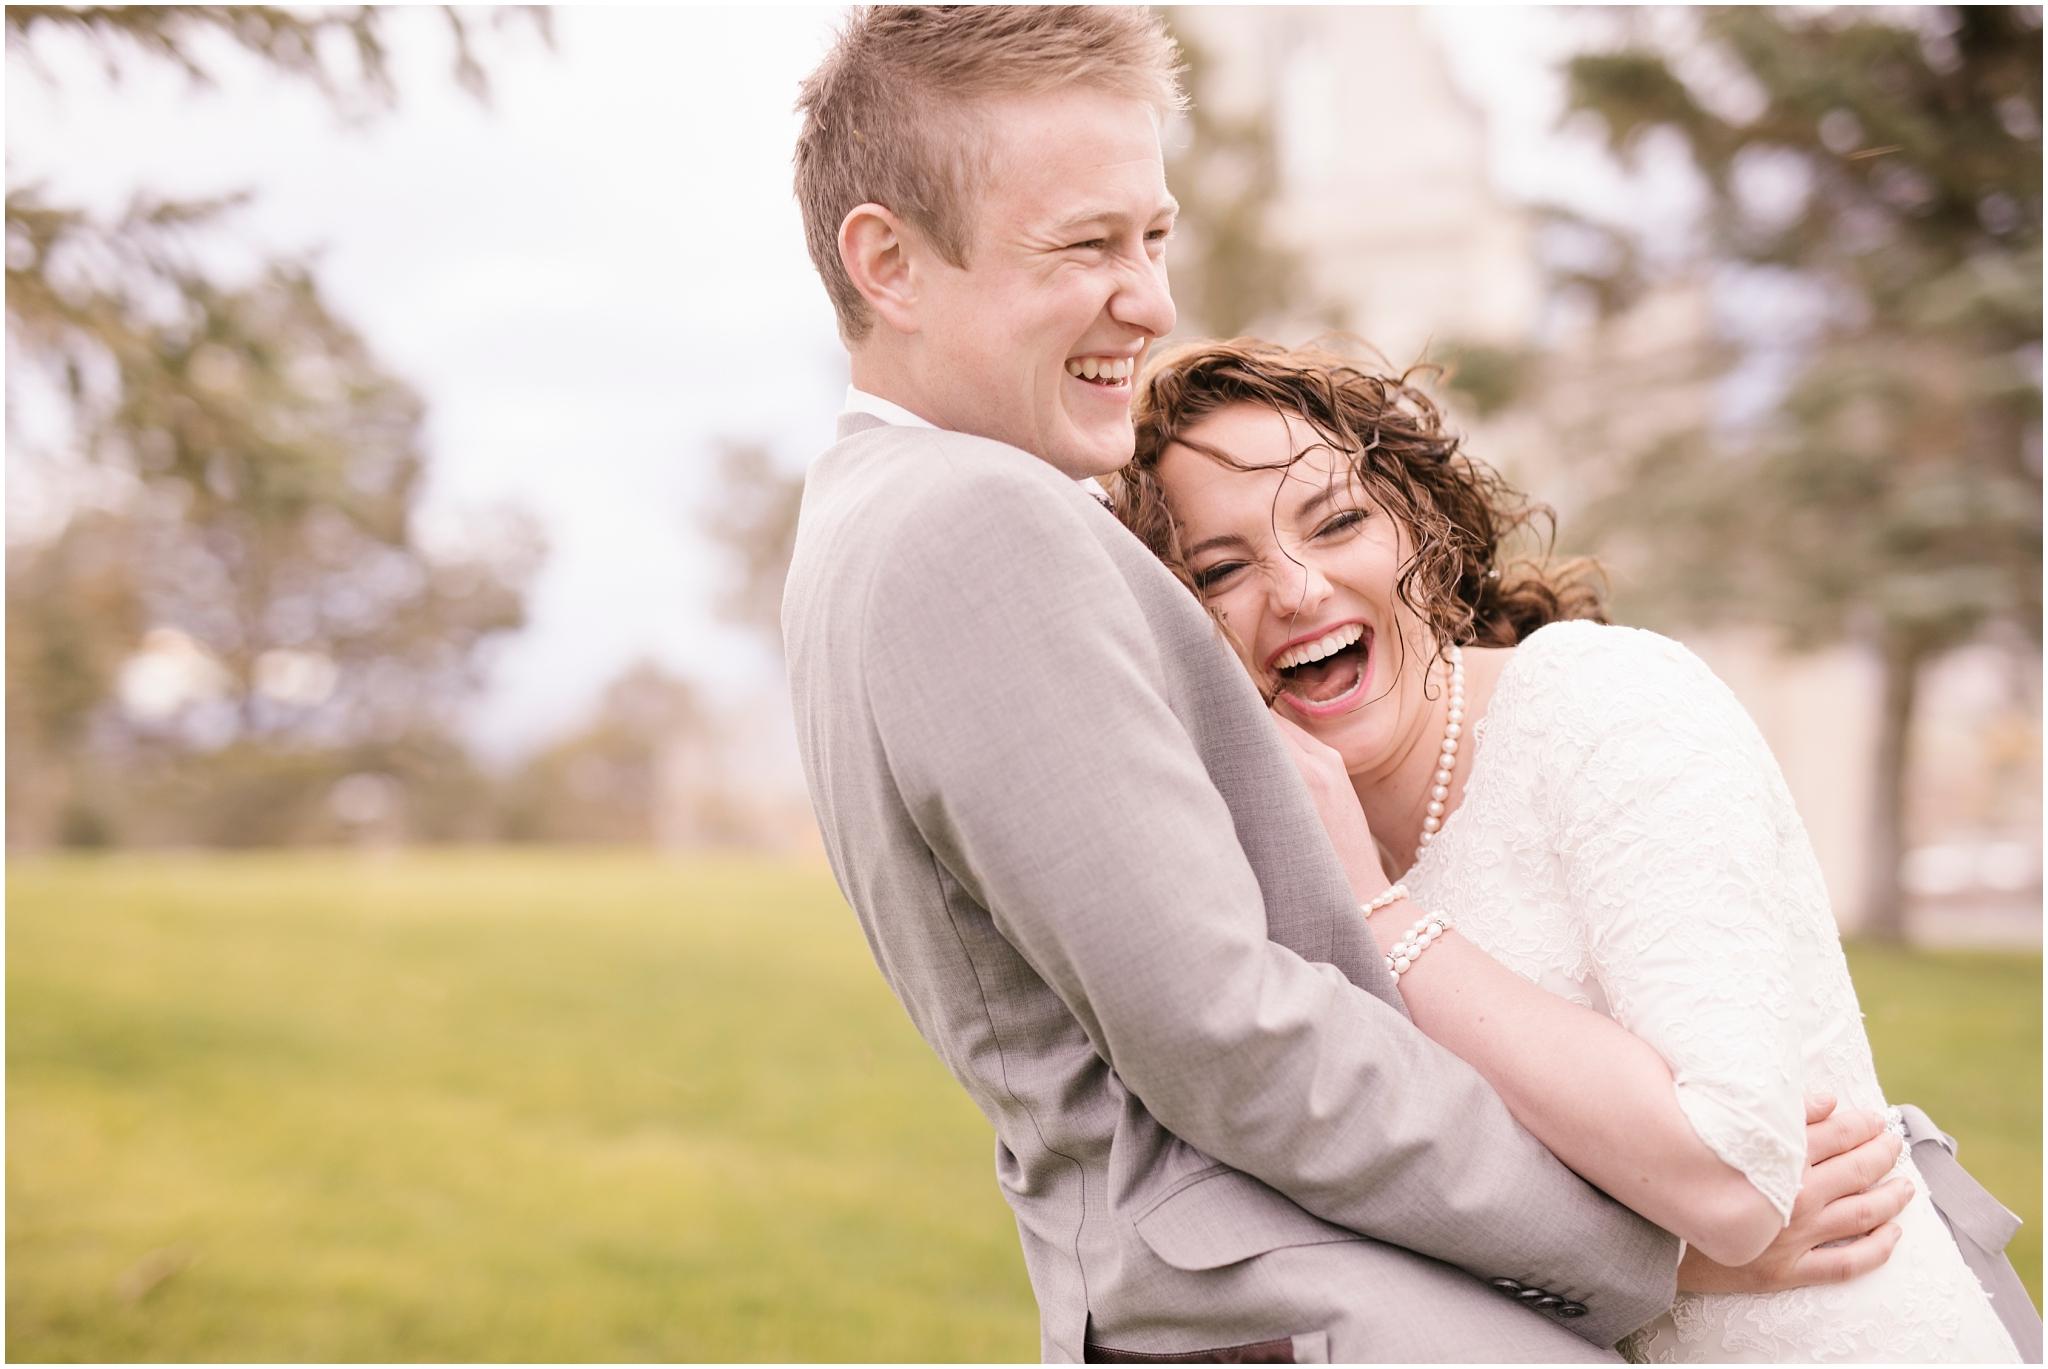 BA-Bridals-114_Lizzie-B-Imagery-Utah-Wedding-Photographer-Central-Utah-Photographer-Utah-County-Manti-Utah-Temple.jpg